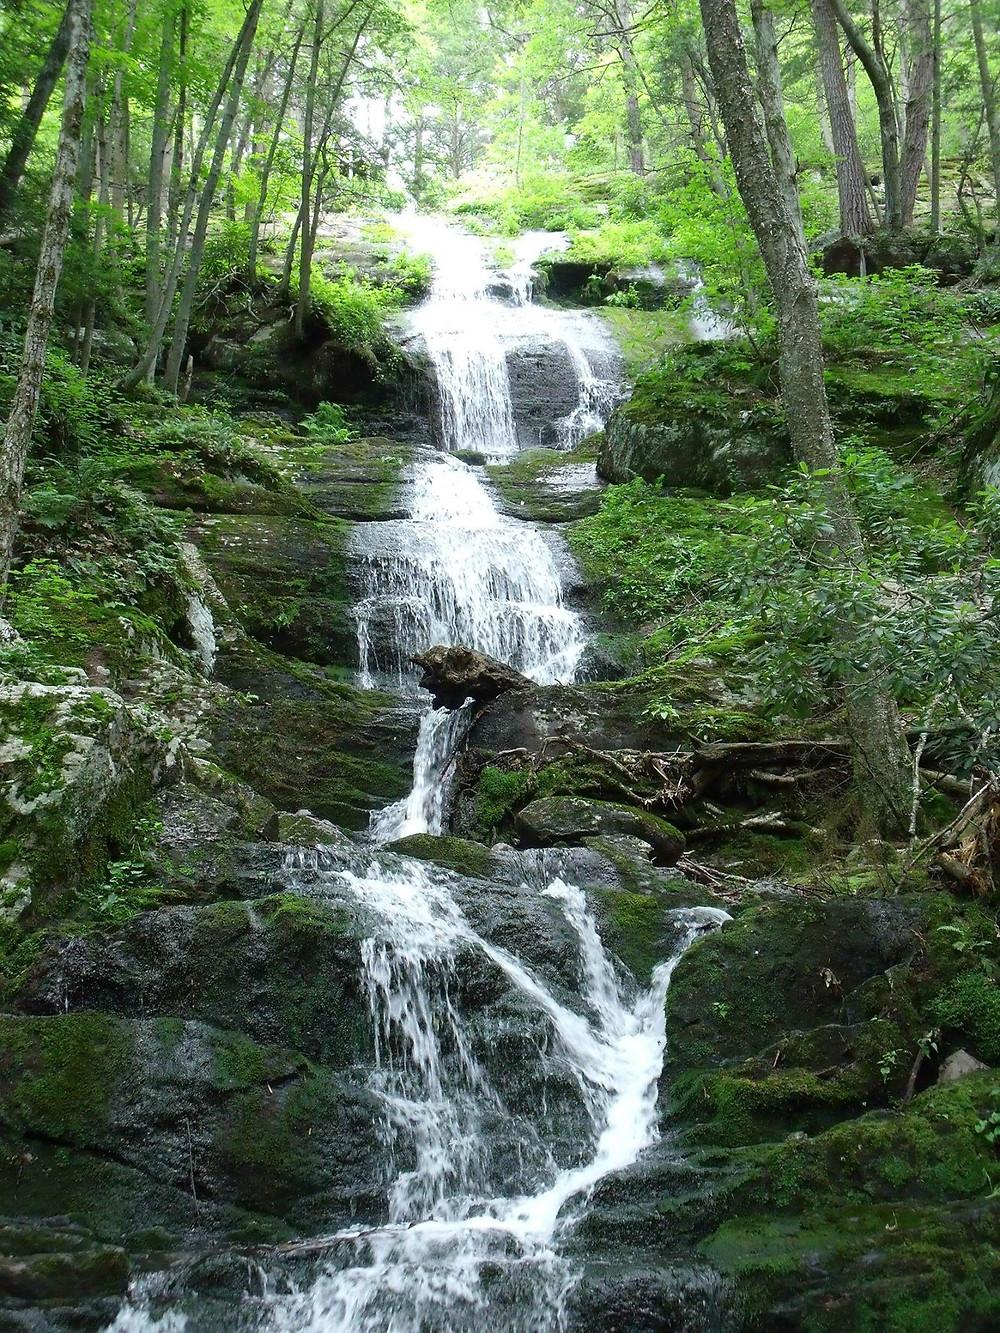 Multiple waterfalls cascade down the hillside - Buttermilk Falls in New Jersey